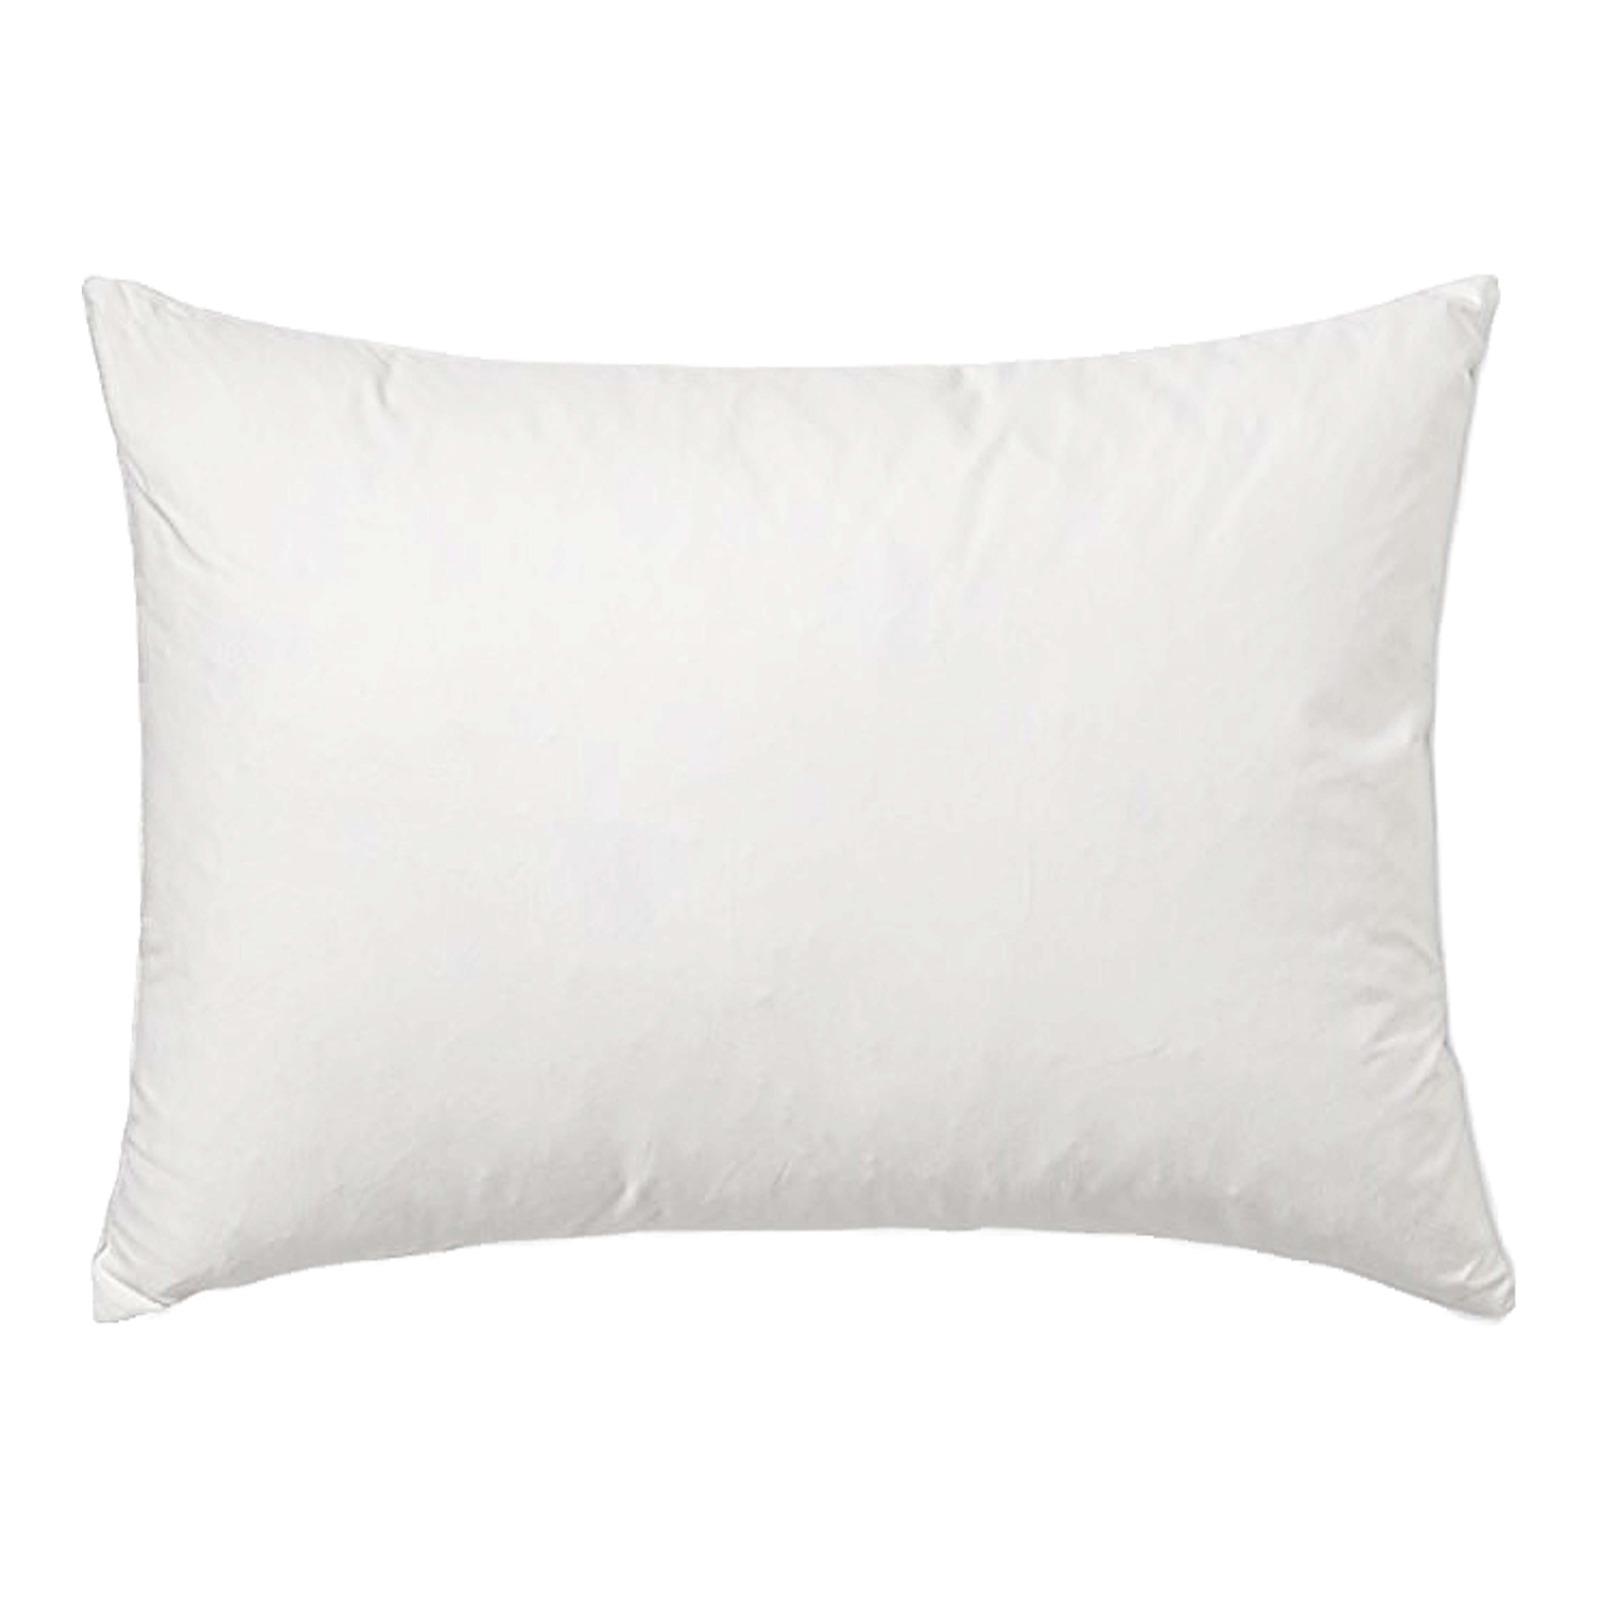 Goodliving Mood Pillow